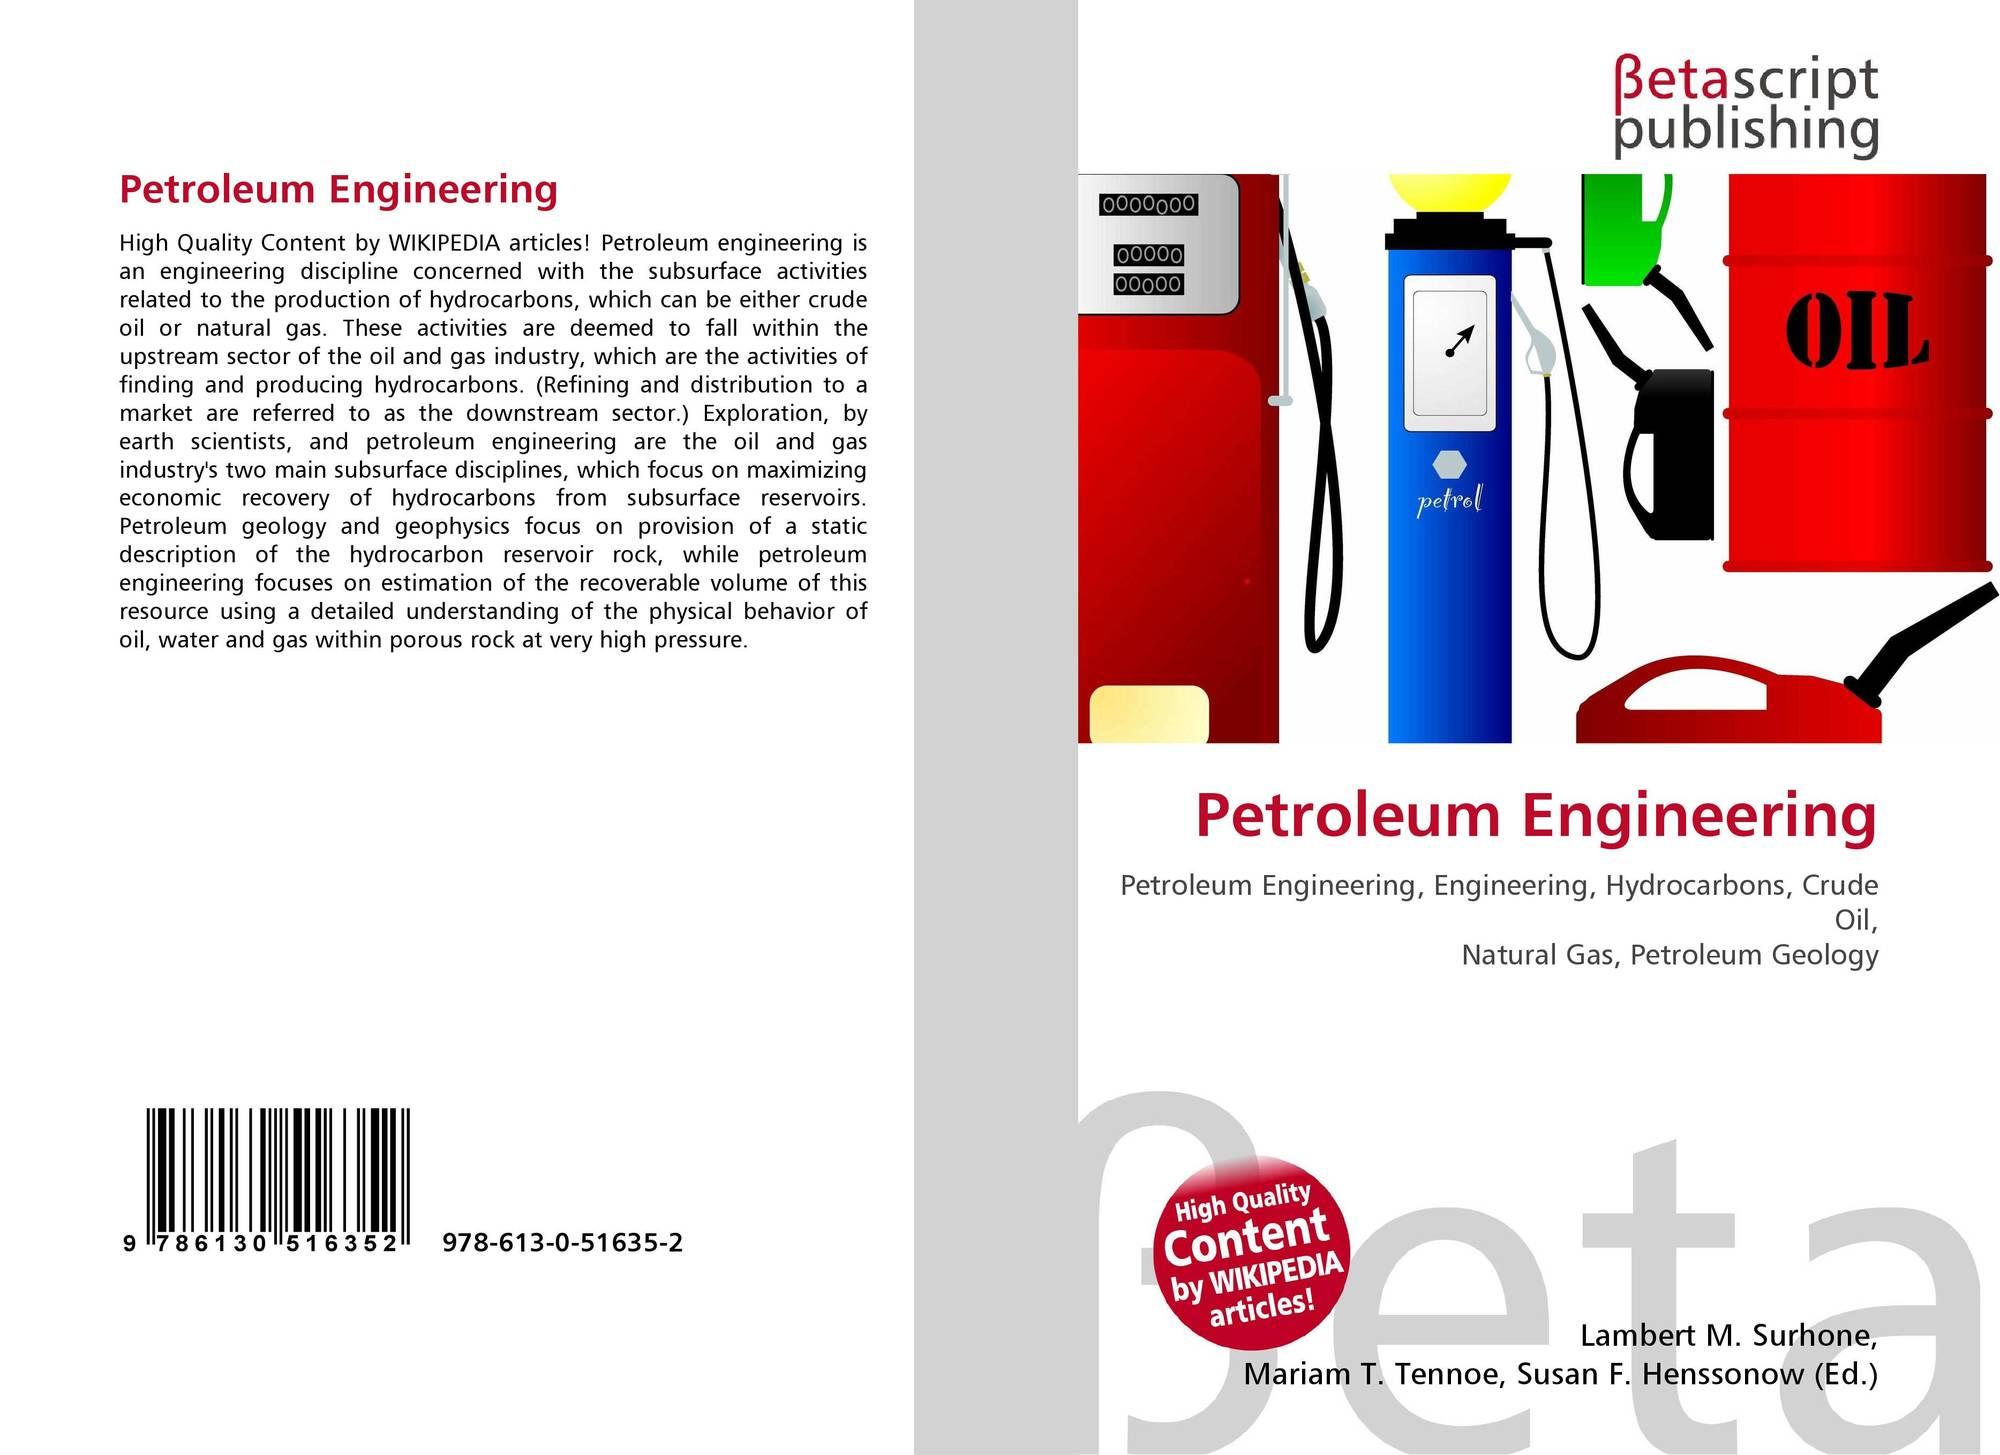 Petroleum Engineering, 978-613-0-51635-2, 6130516355